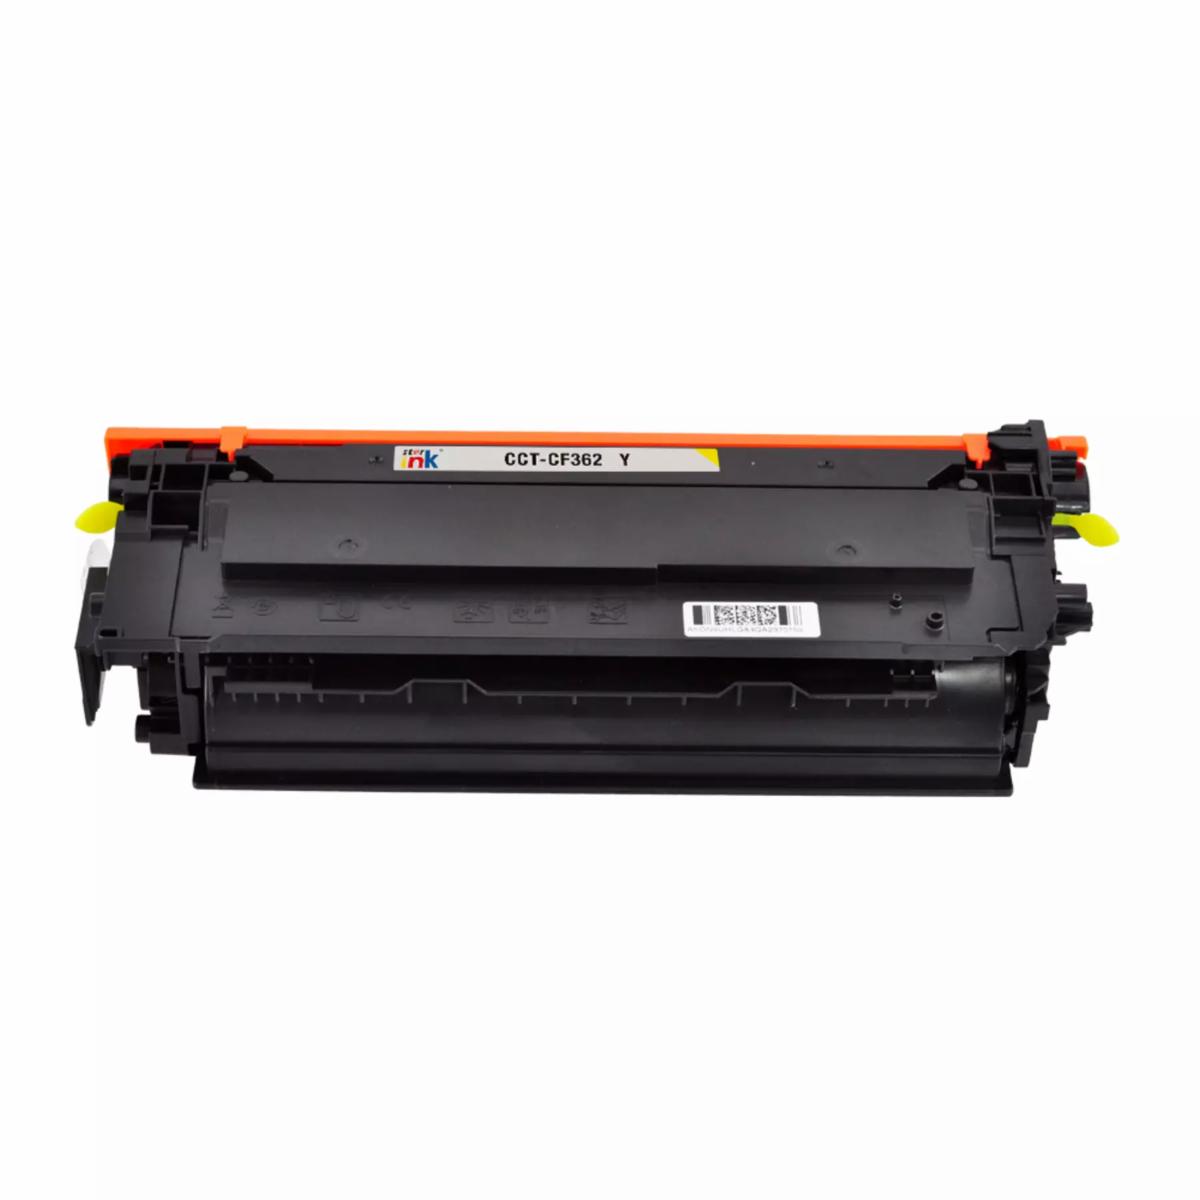 Starink kompatibilný toner HP 508X, HP CF362X (Žltý)